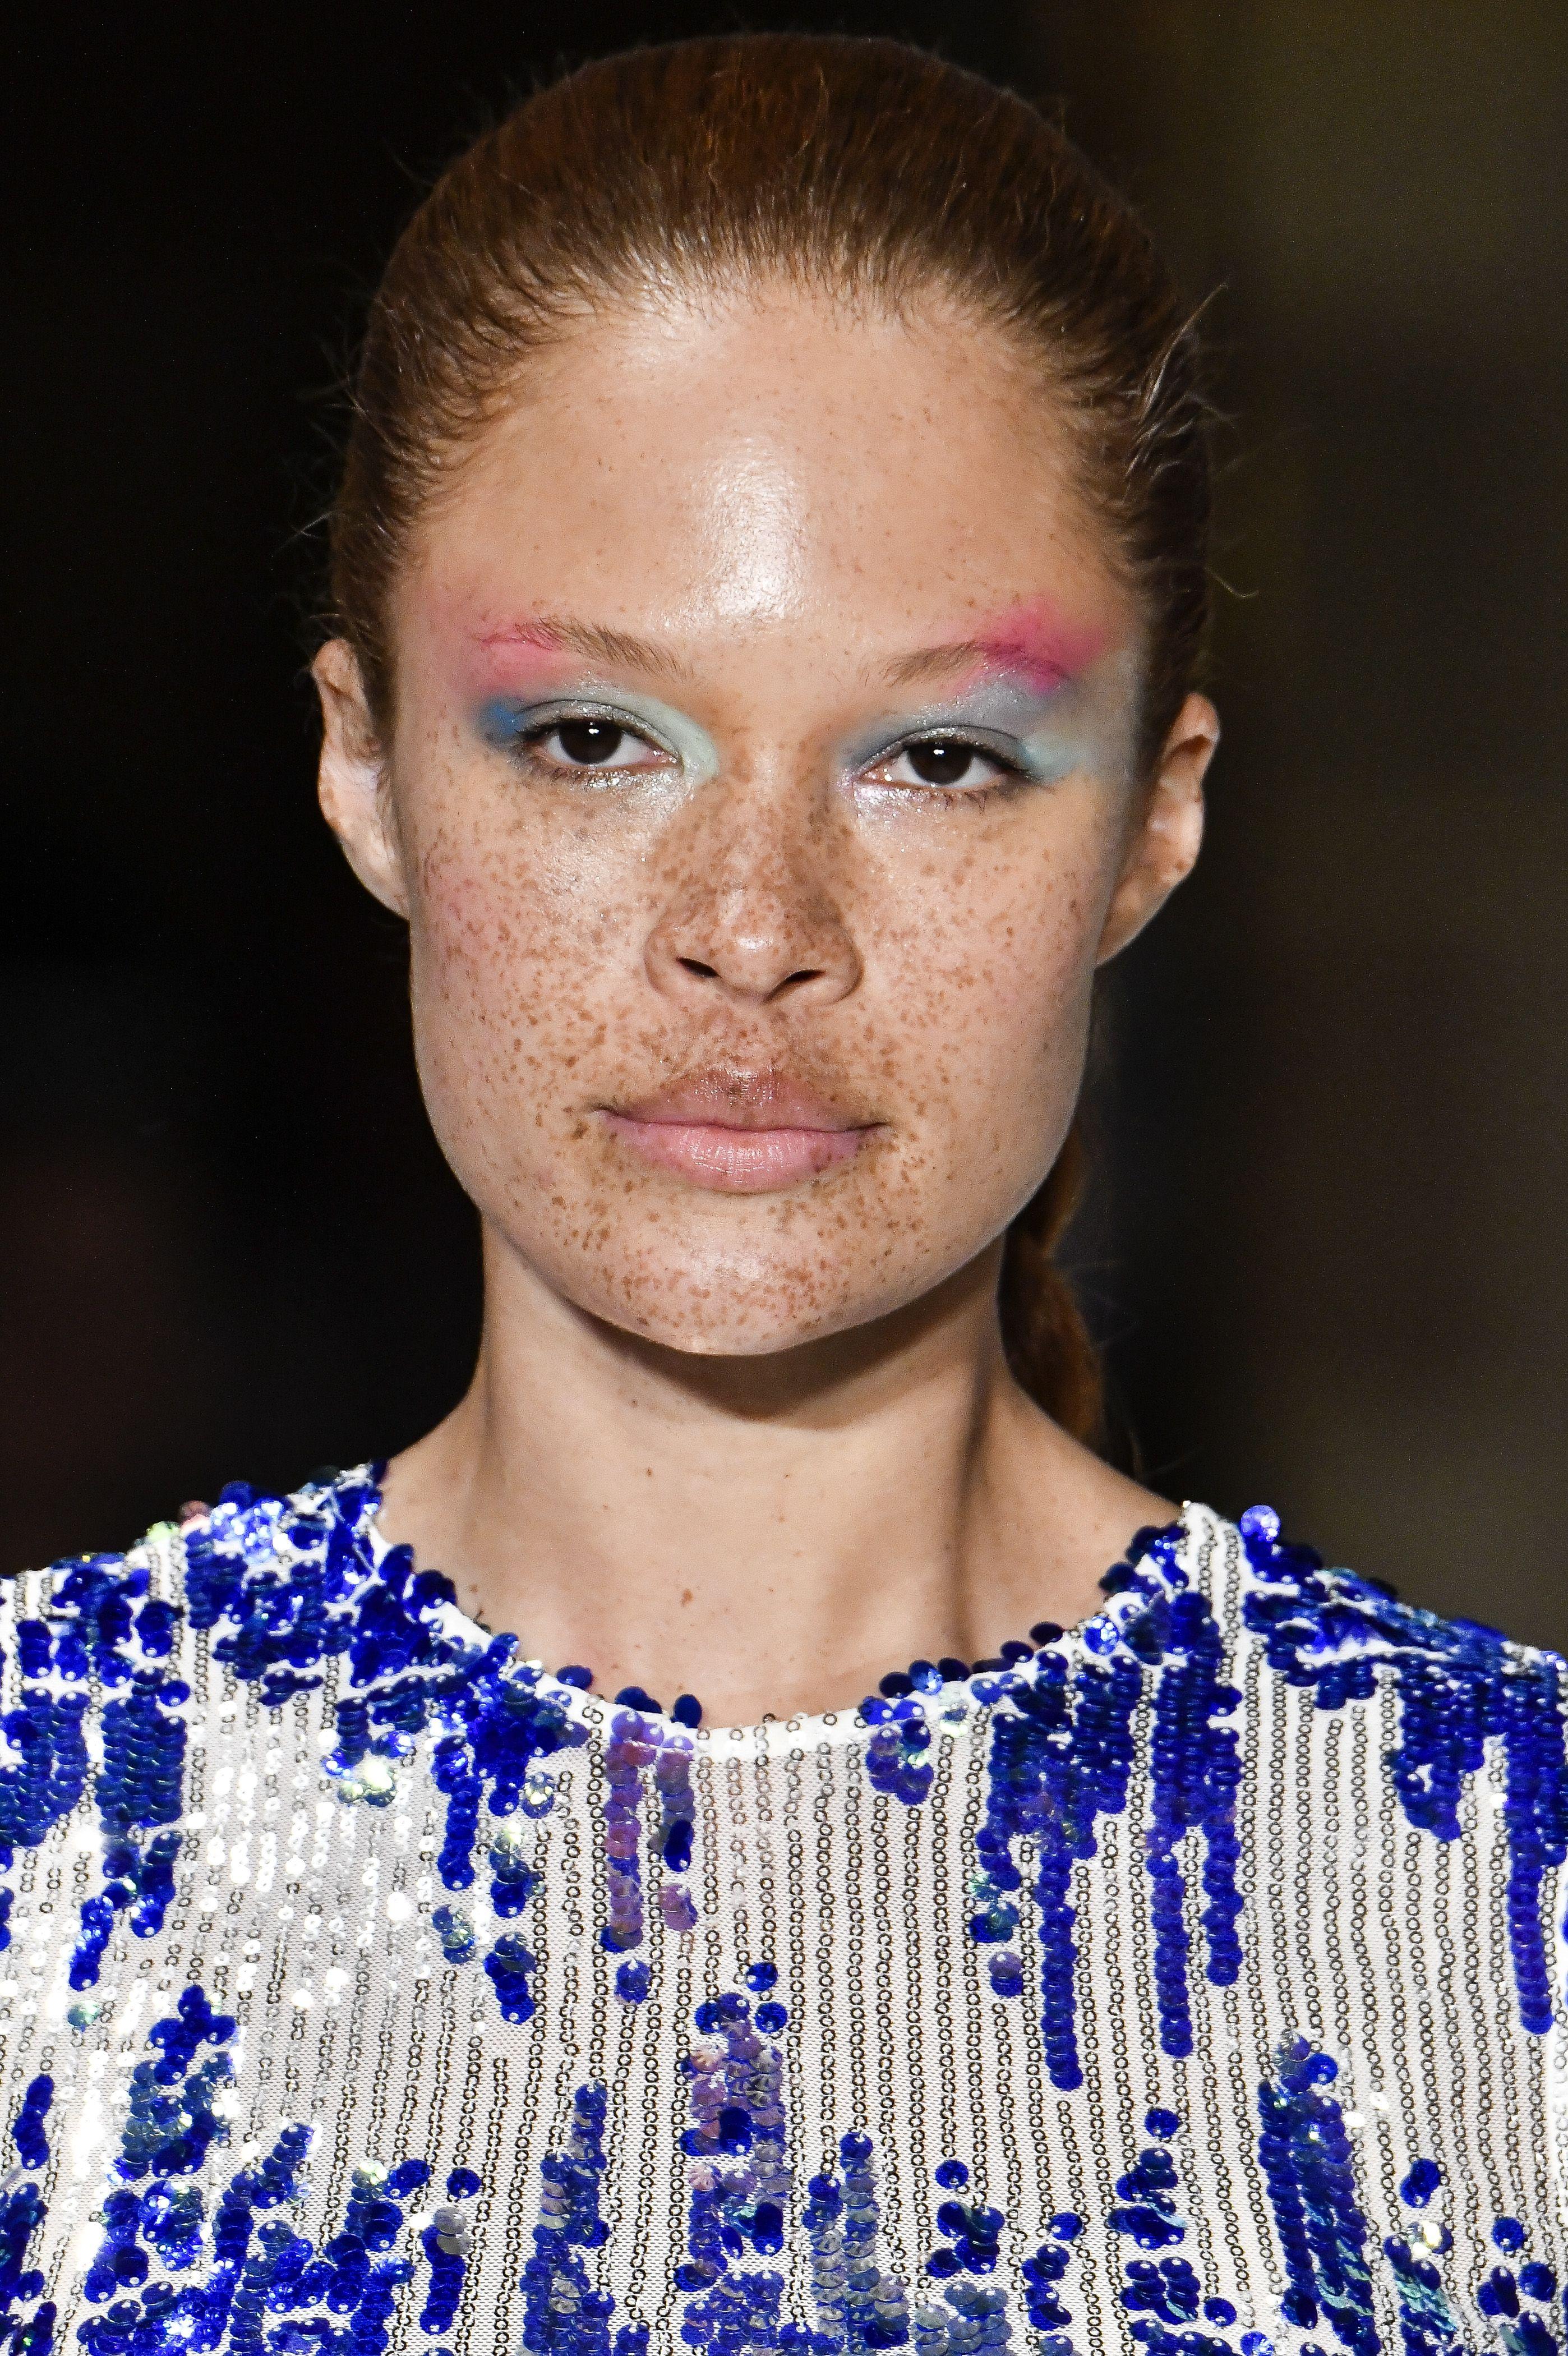 Euphoria\u0027 Makeup Tutorial From the Runway to the Real Way